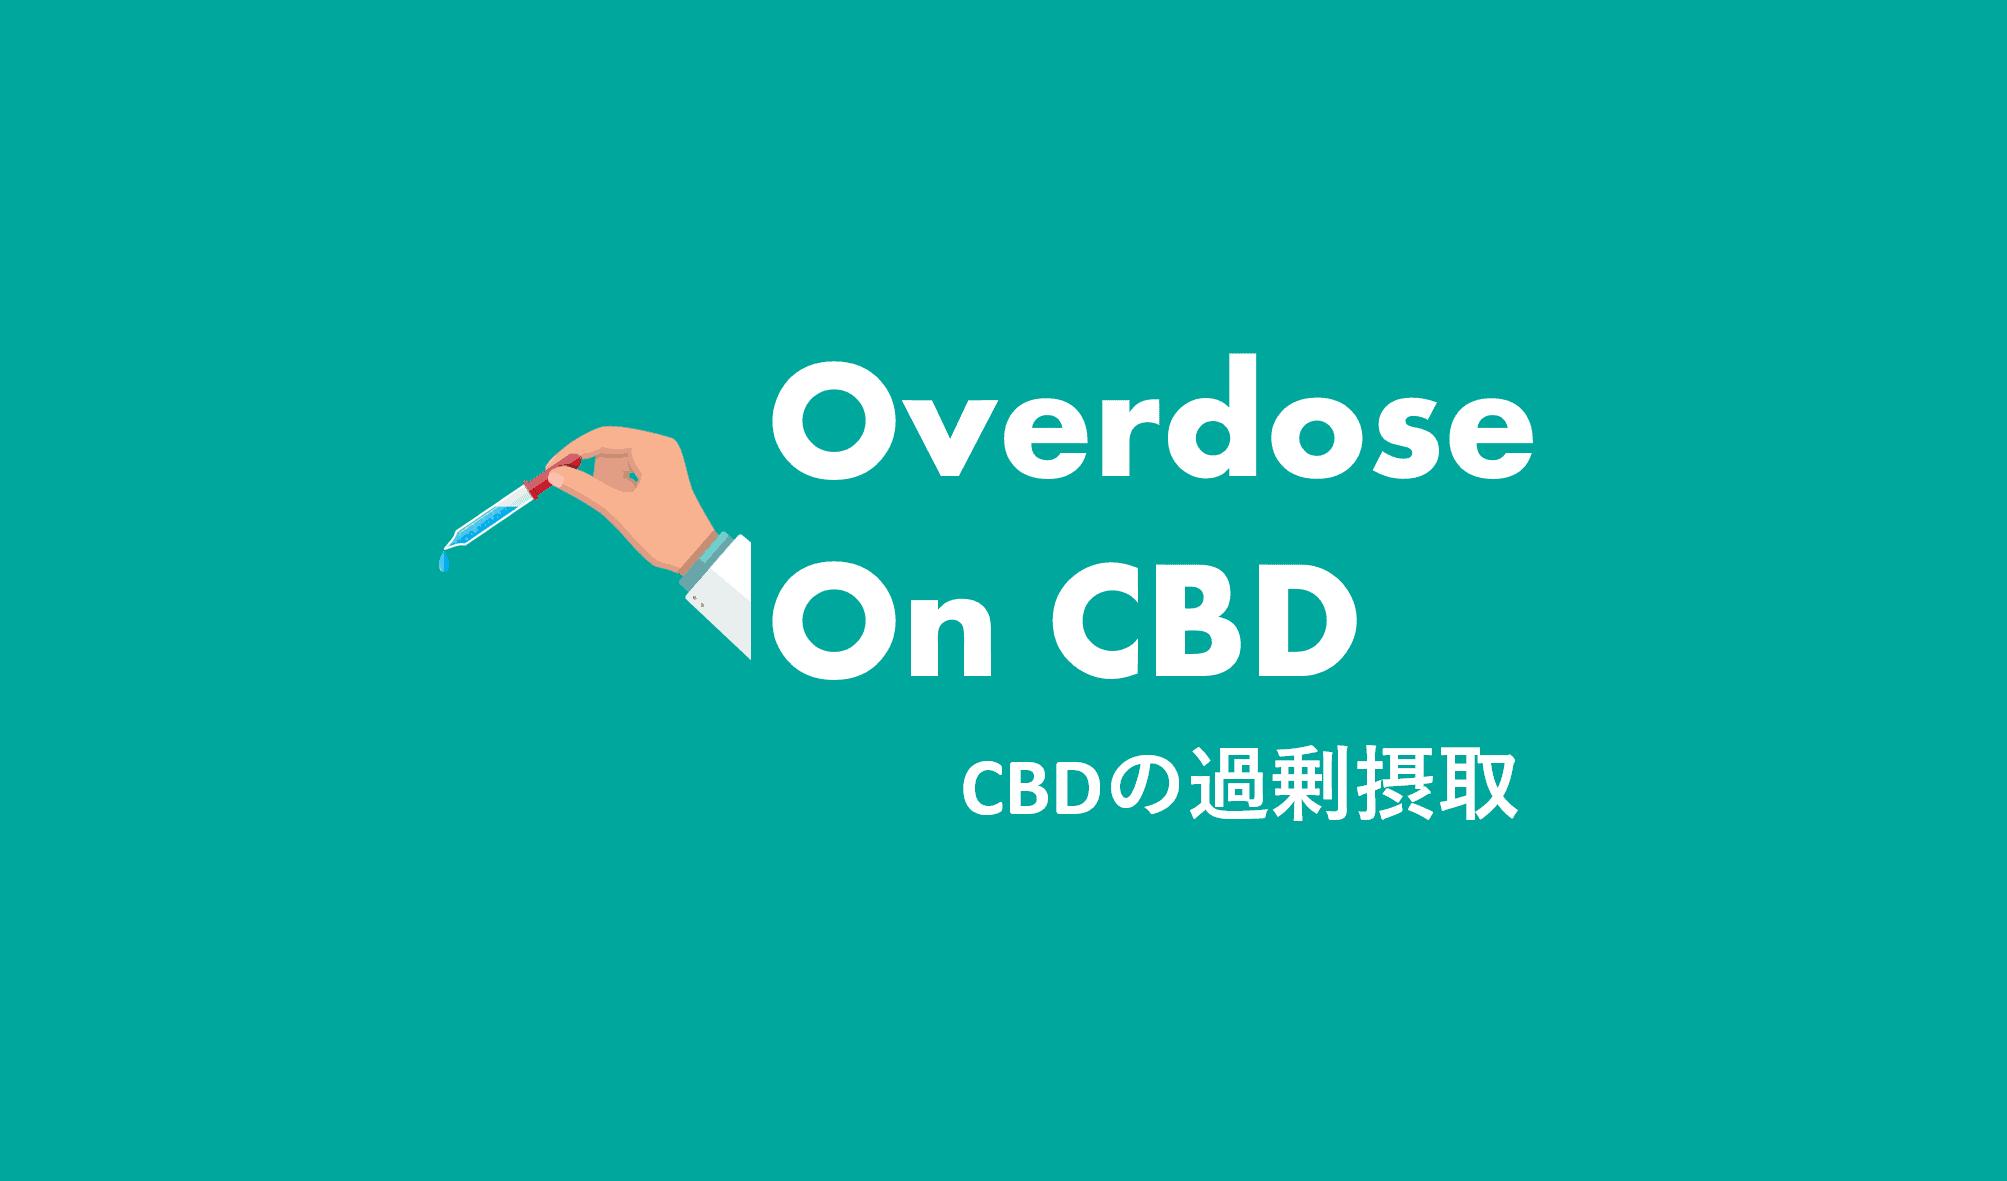 CBDオイルのとりすぎ・過剰摂取は危険?CBDのウソ・ホント